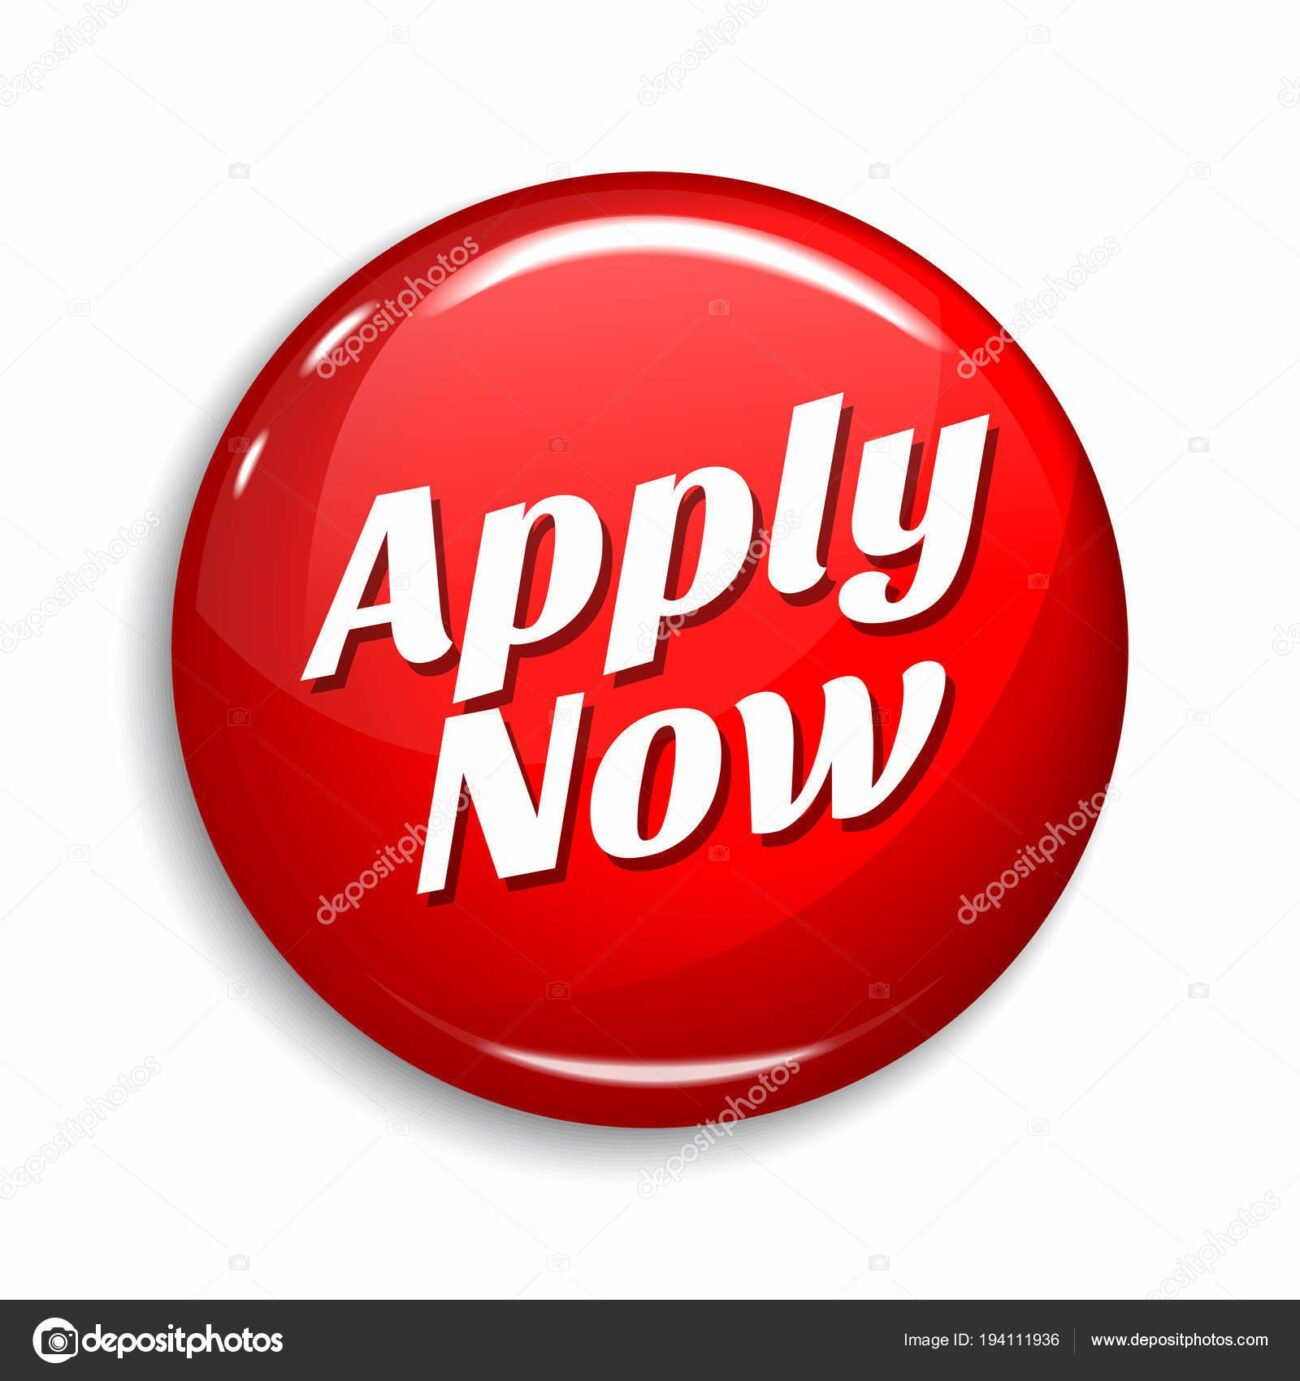 guarantor non homeowner can i still get loan apply now circular red button